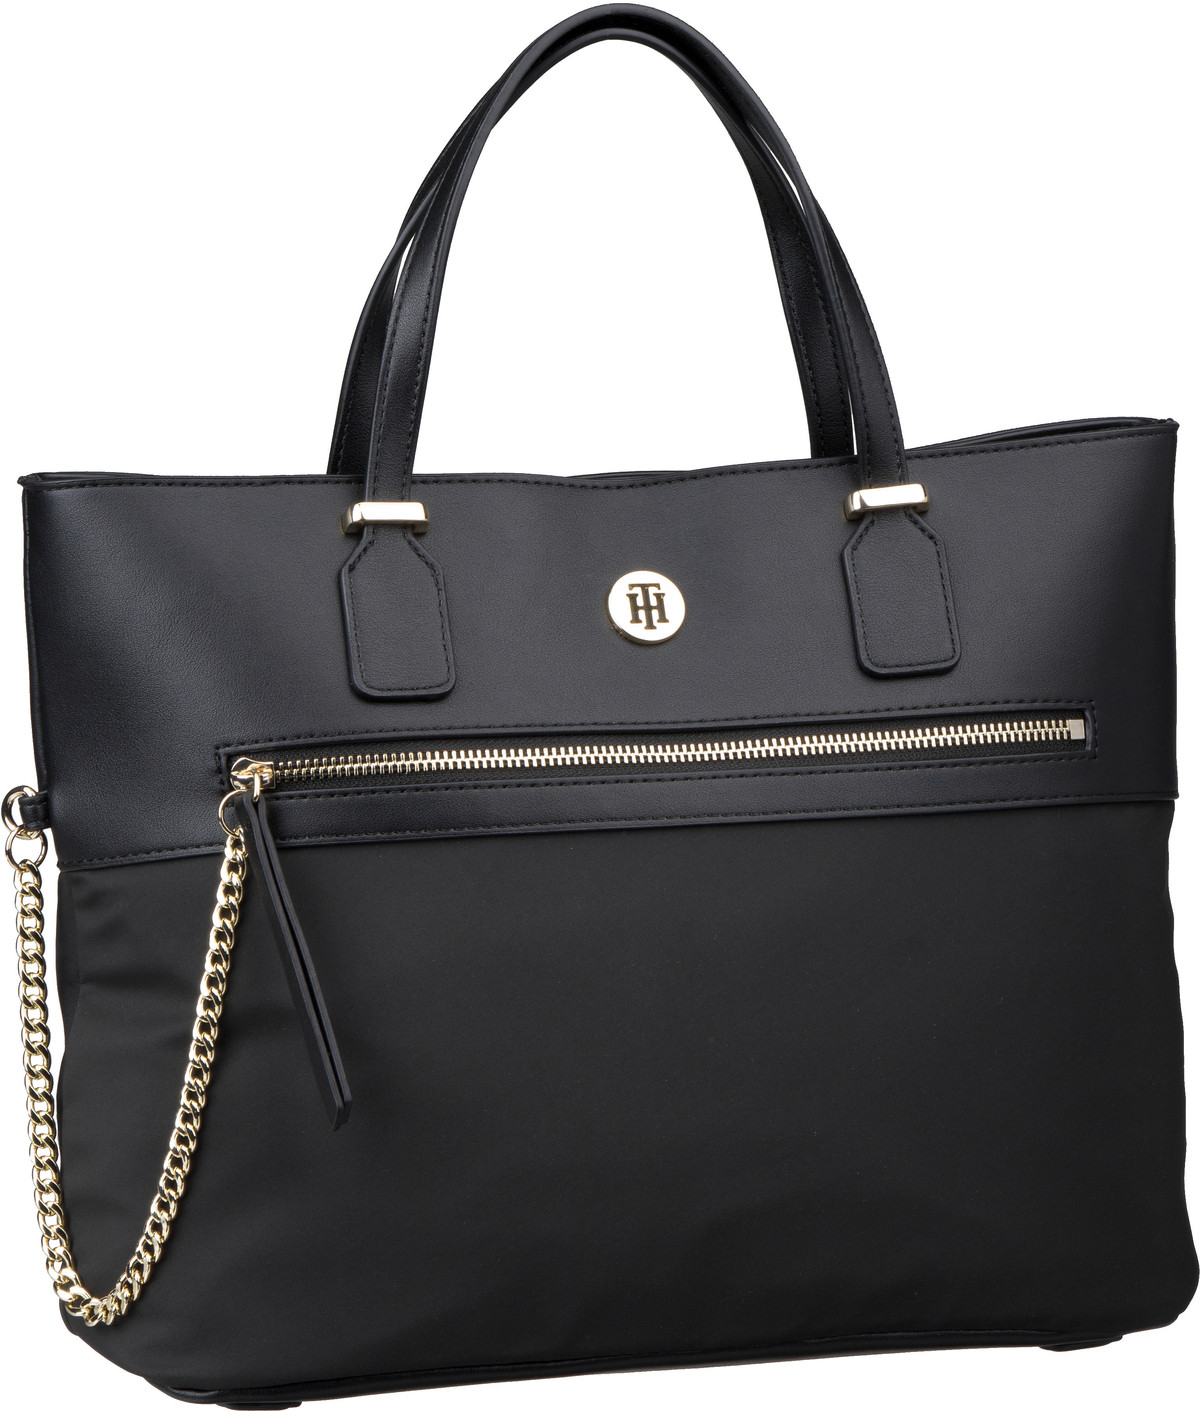 Handtasche Core Nylon Med Tote 6825 Black